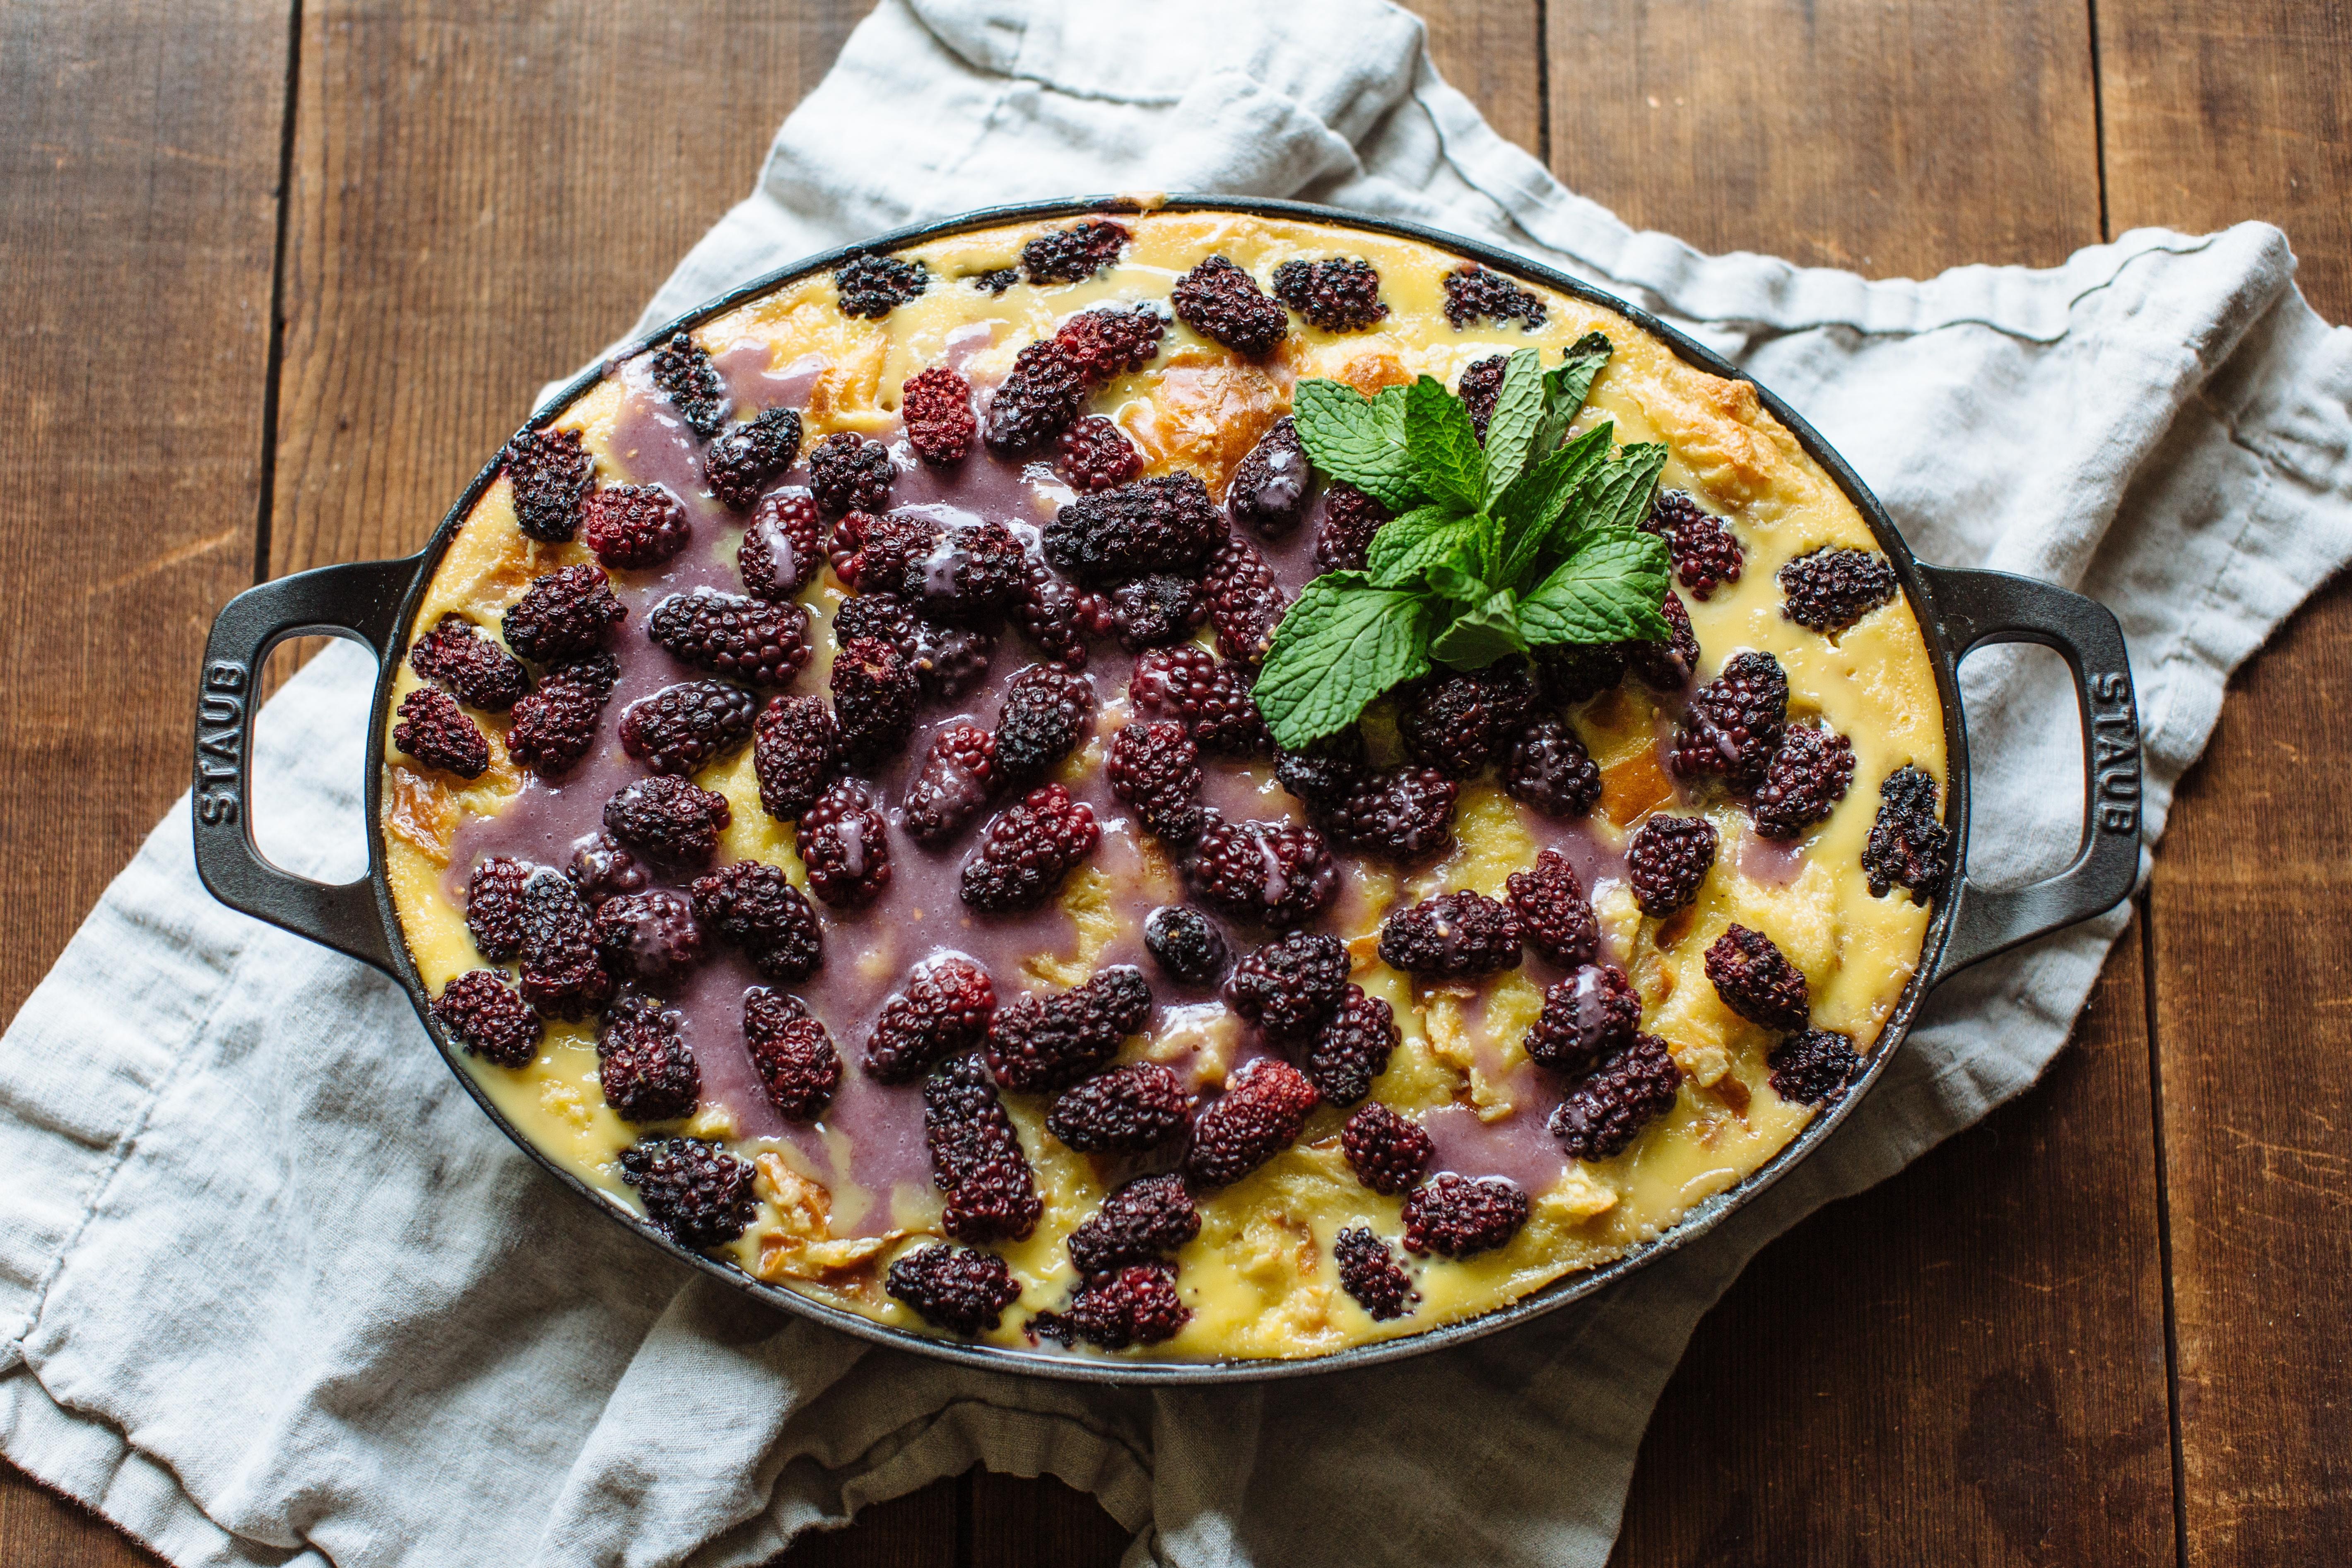 Blackberry & White Chocolate Bread Pudding